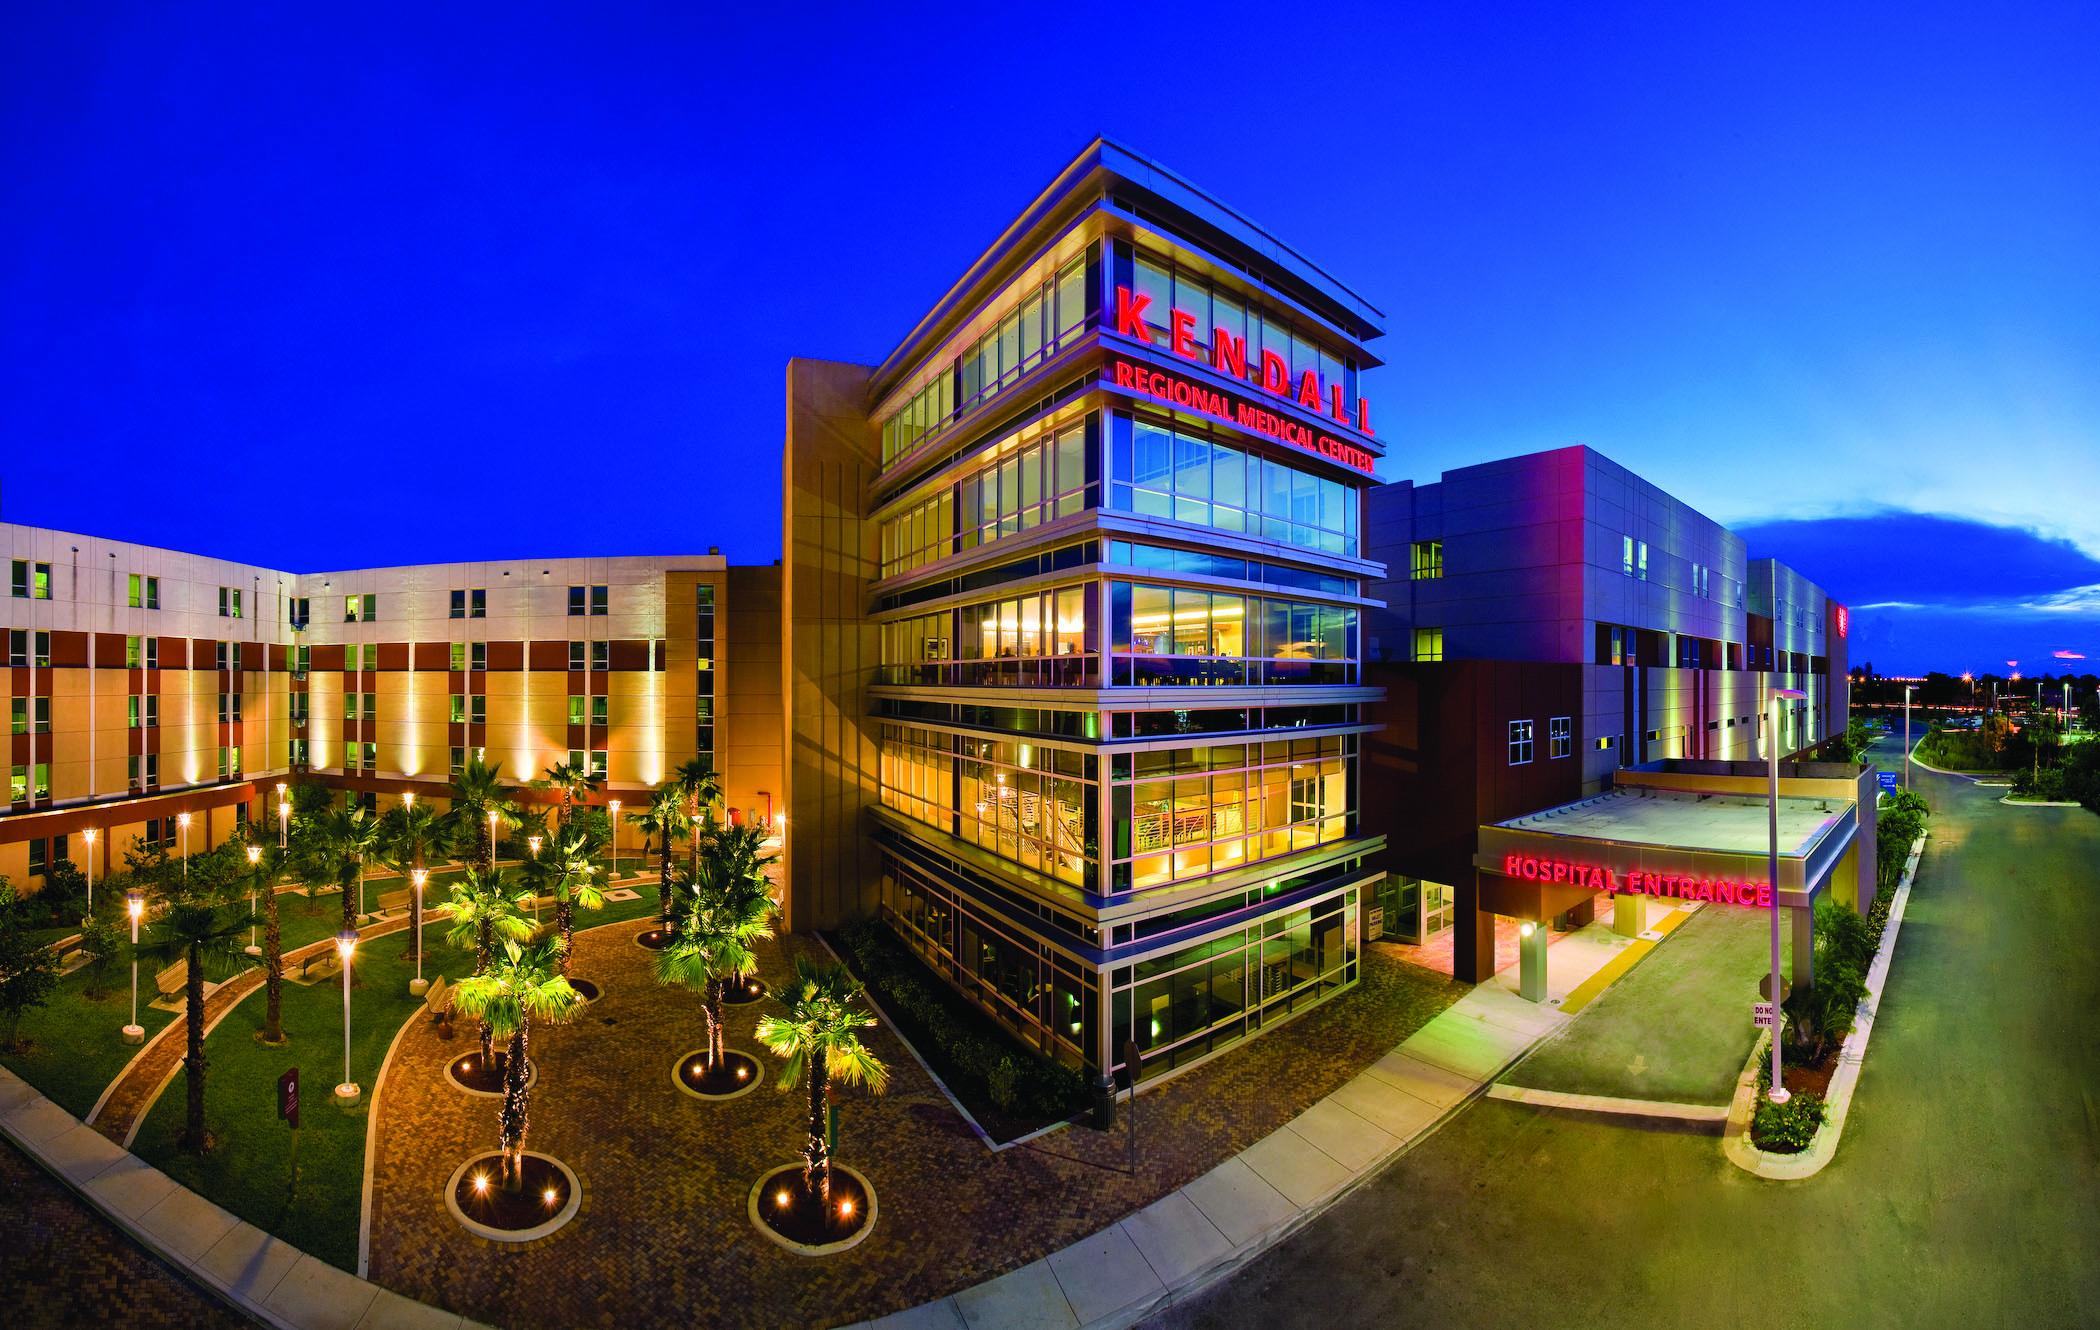 Kendall Regional Medical Center